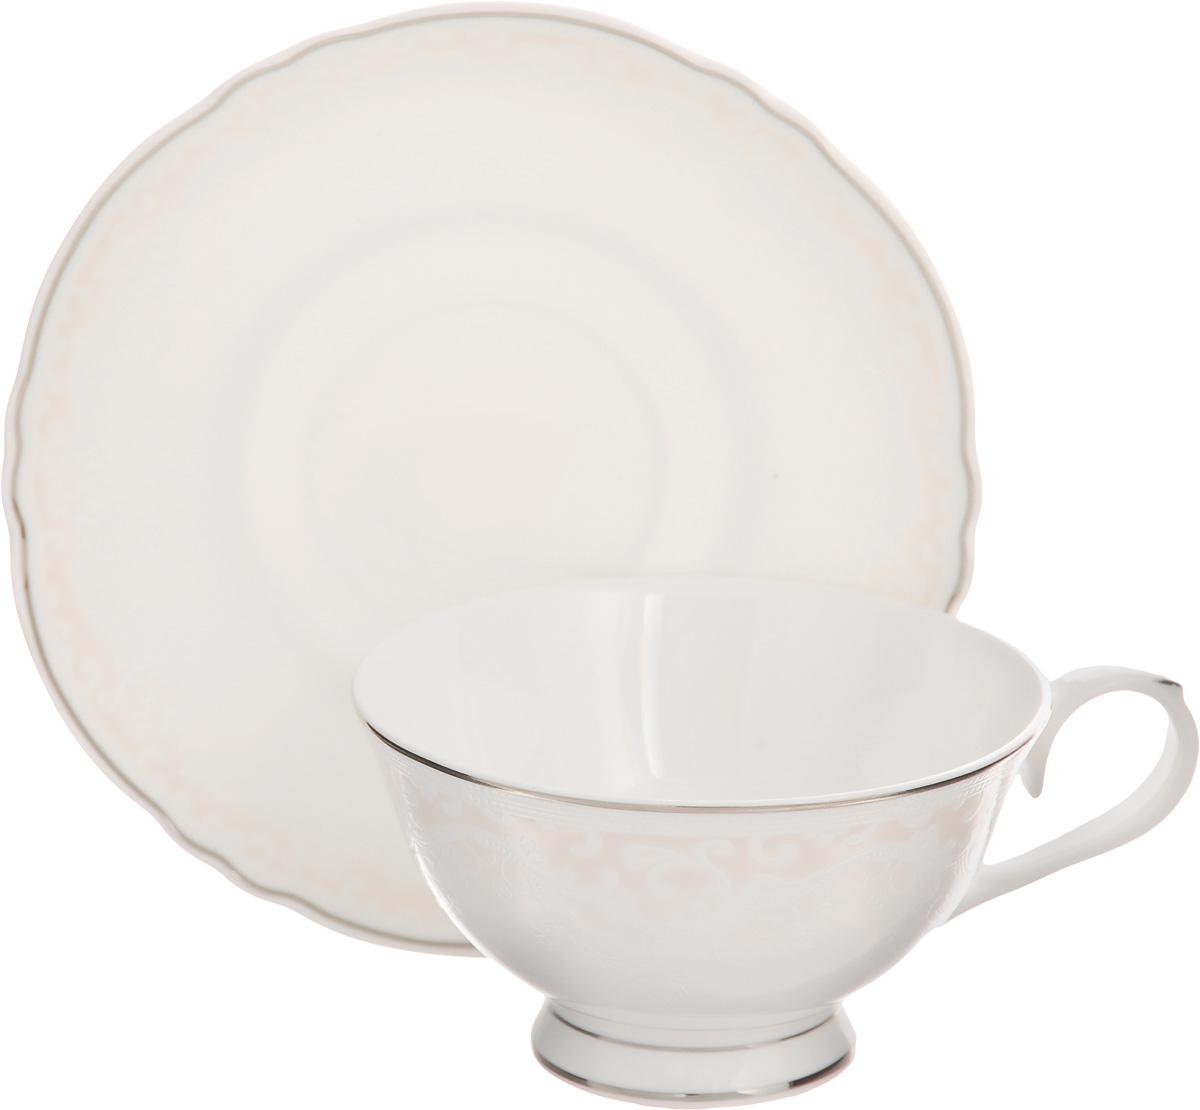 Чайная пара Elan Gallery Розовый шик, 220 мл, 2 предмета чайная пара elan gallery сиреневый туман 2 предмета